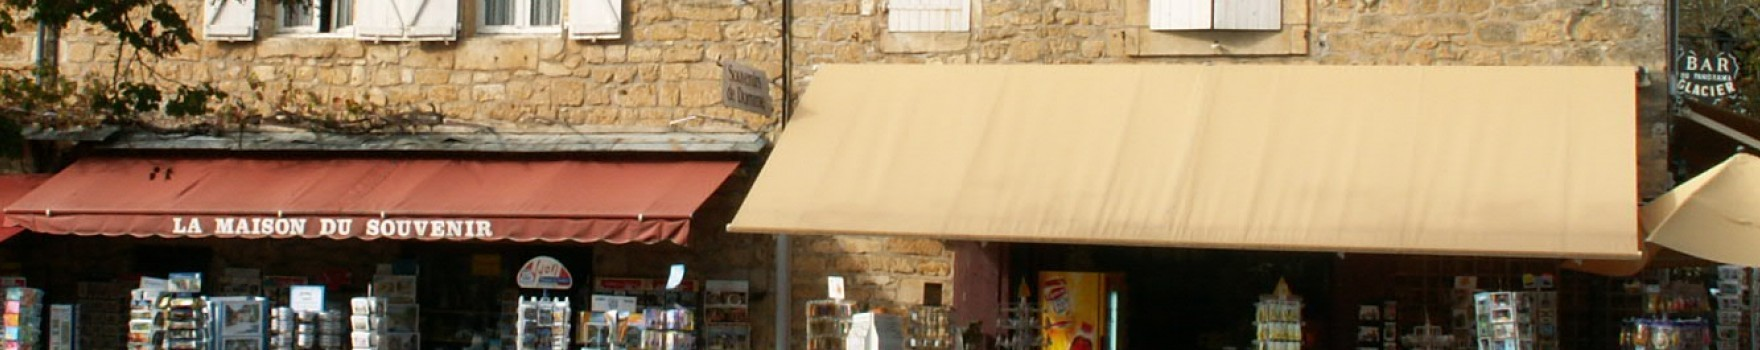 Commerces Dordogne